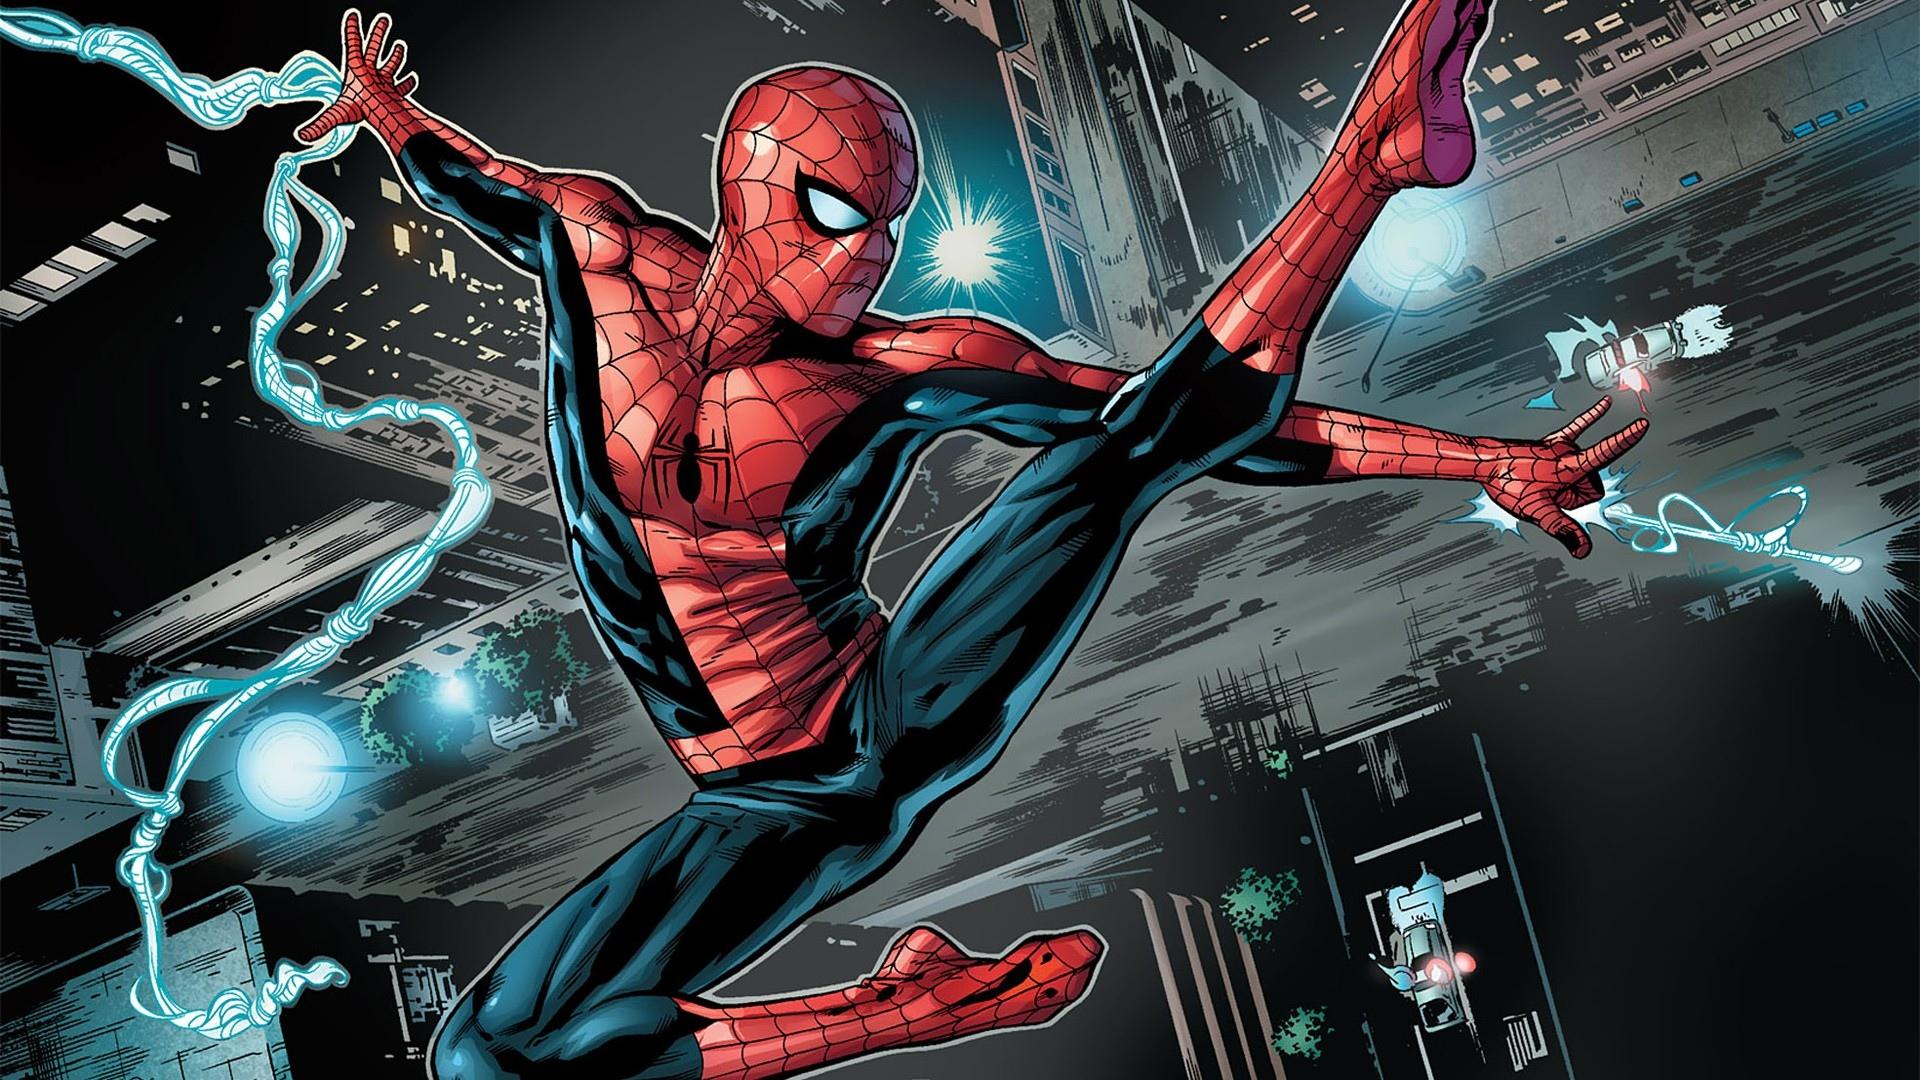 10 Best Spider Man 2099 Wallpaper Full Hd 1080p For Pc: Fondos De Pantalla De Spiderman, Wallpapers